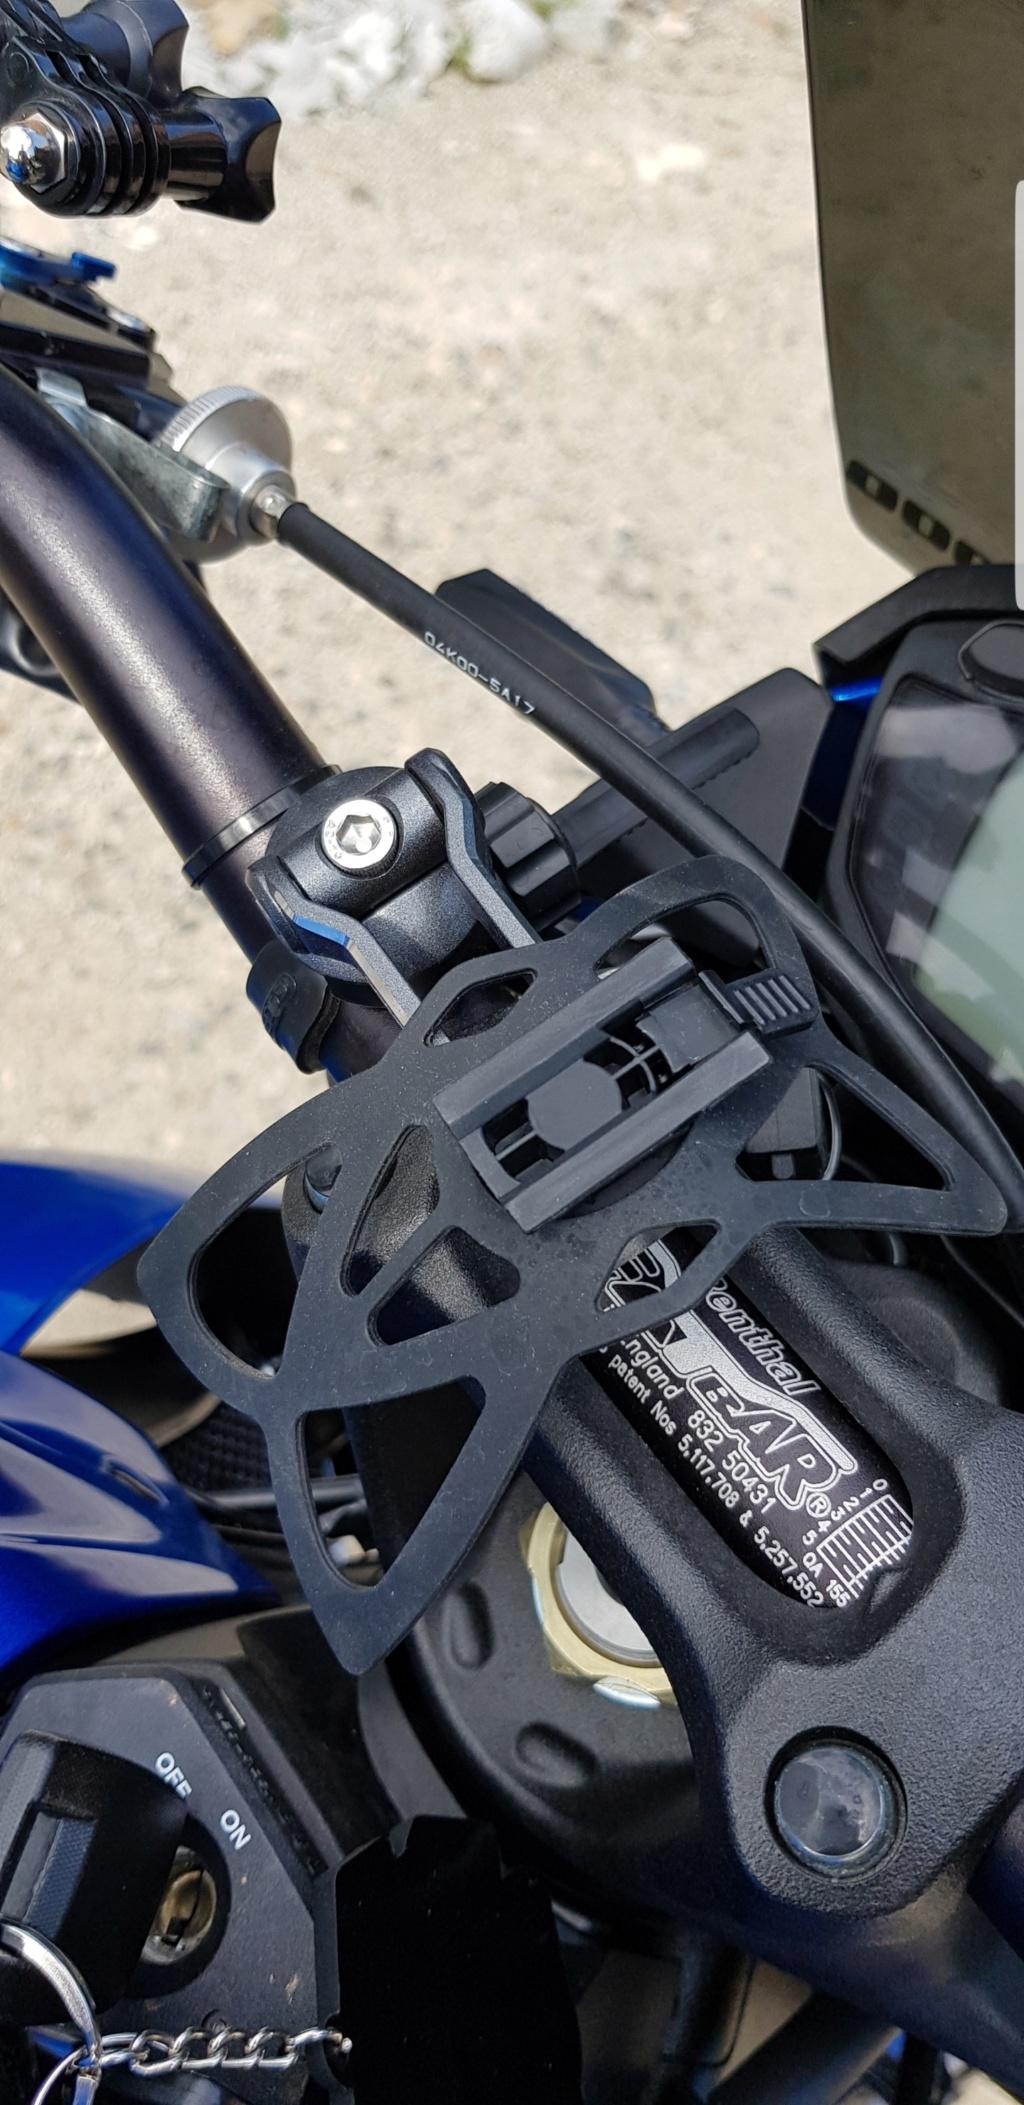 Support guidon top pour GPS et téléphone Screen12